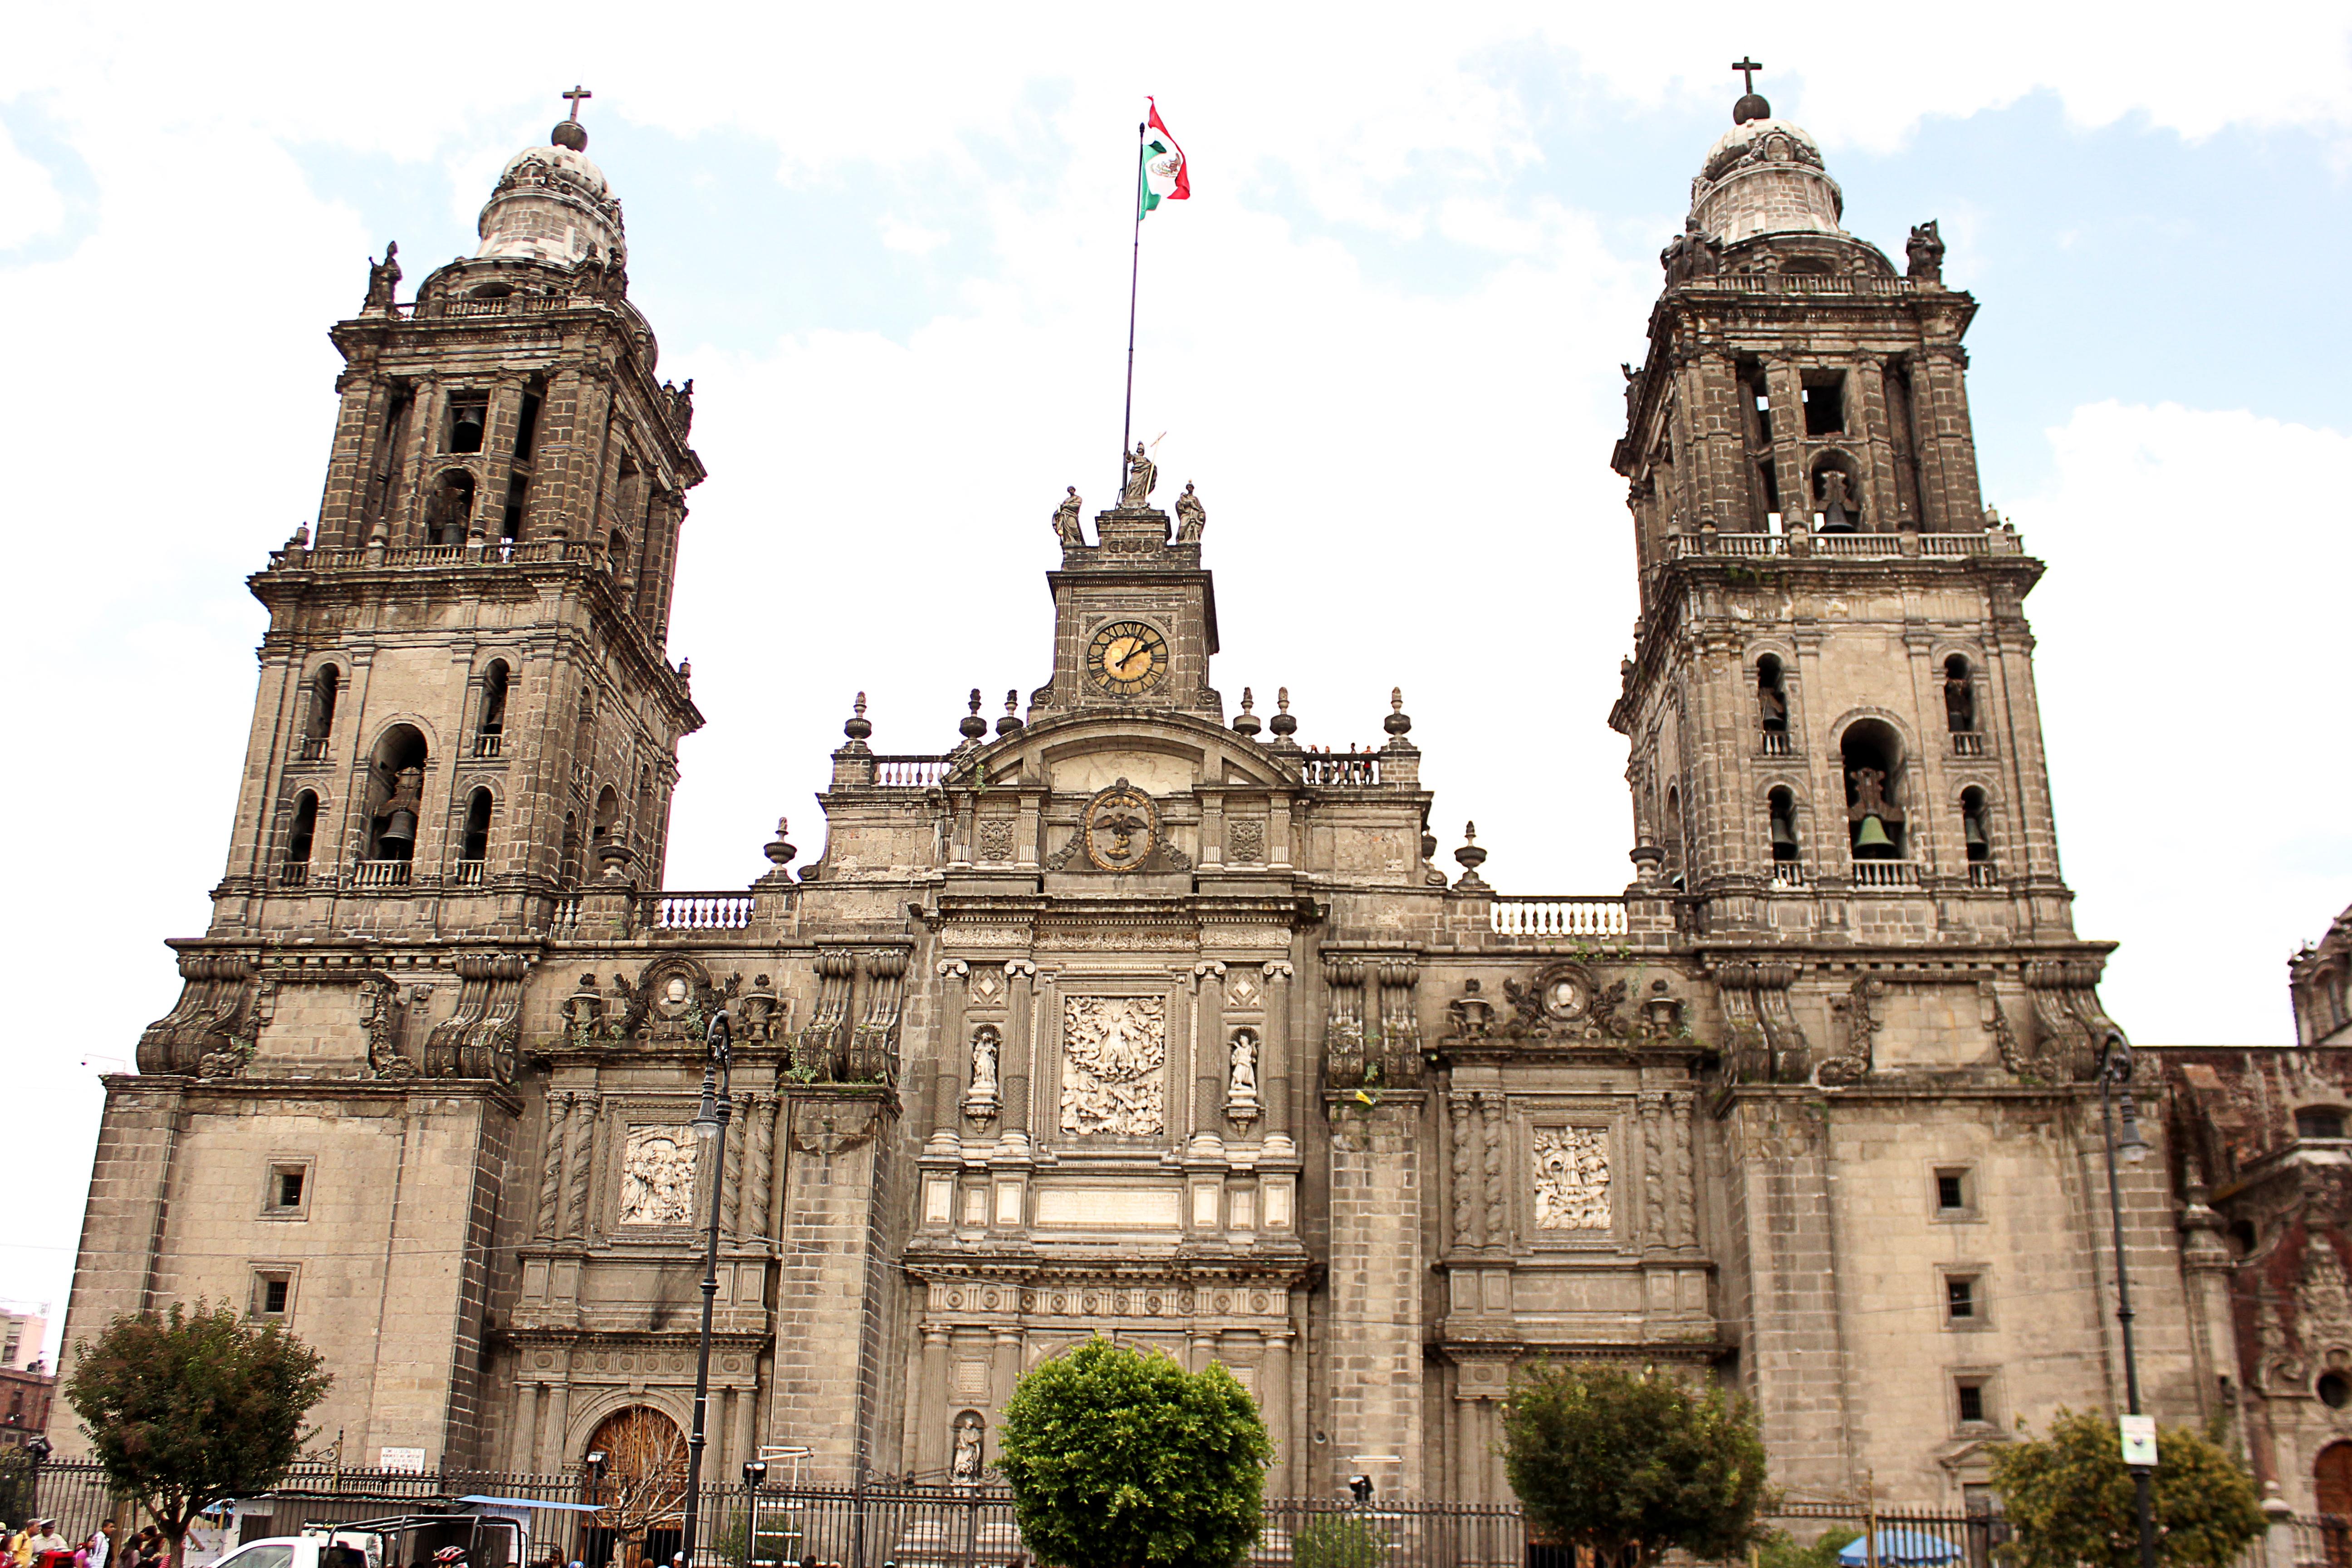 File:Catedral Metropolitana. Fachada.jpg